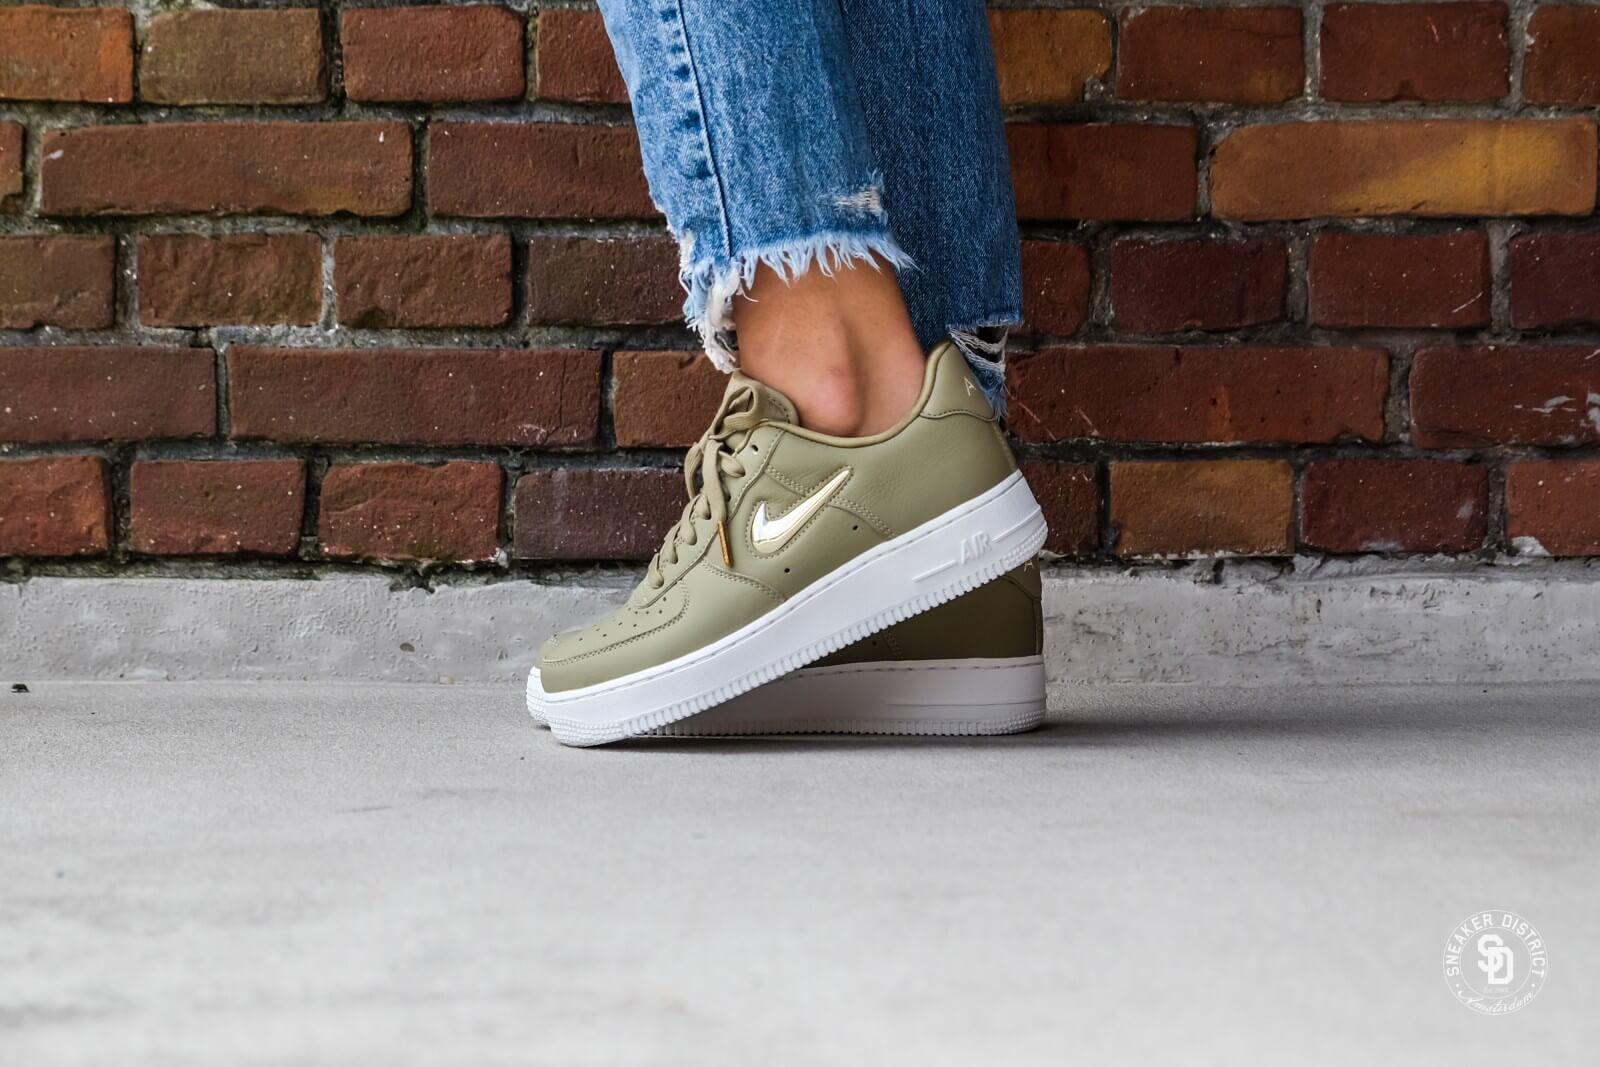 Nike Women's Air Force 1 '07 Premium LX